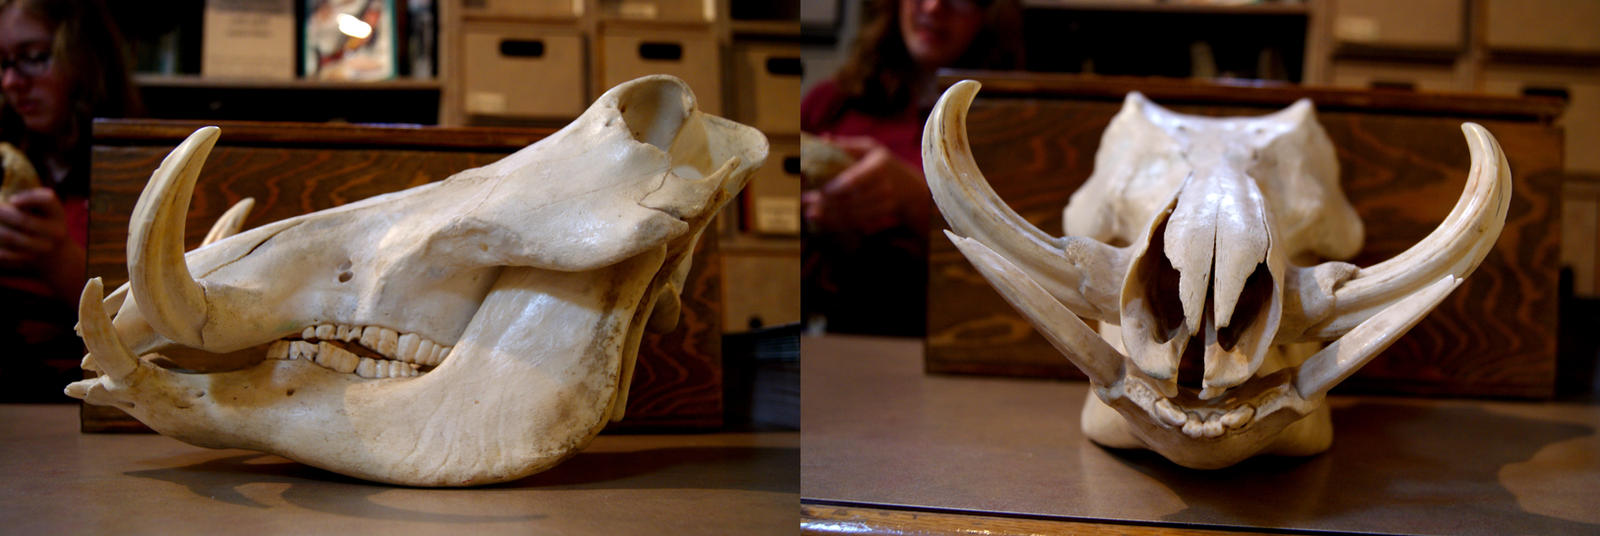 Warthog Skull by Vanwolf